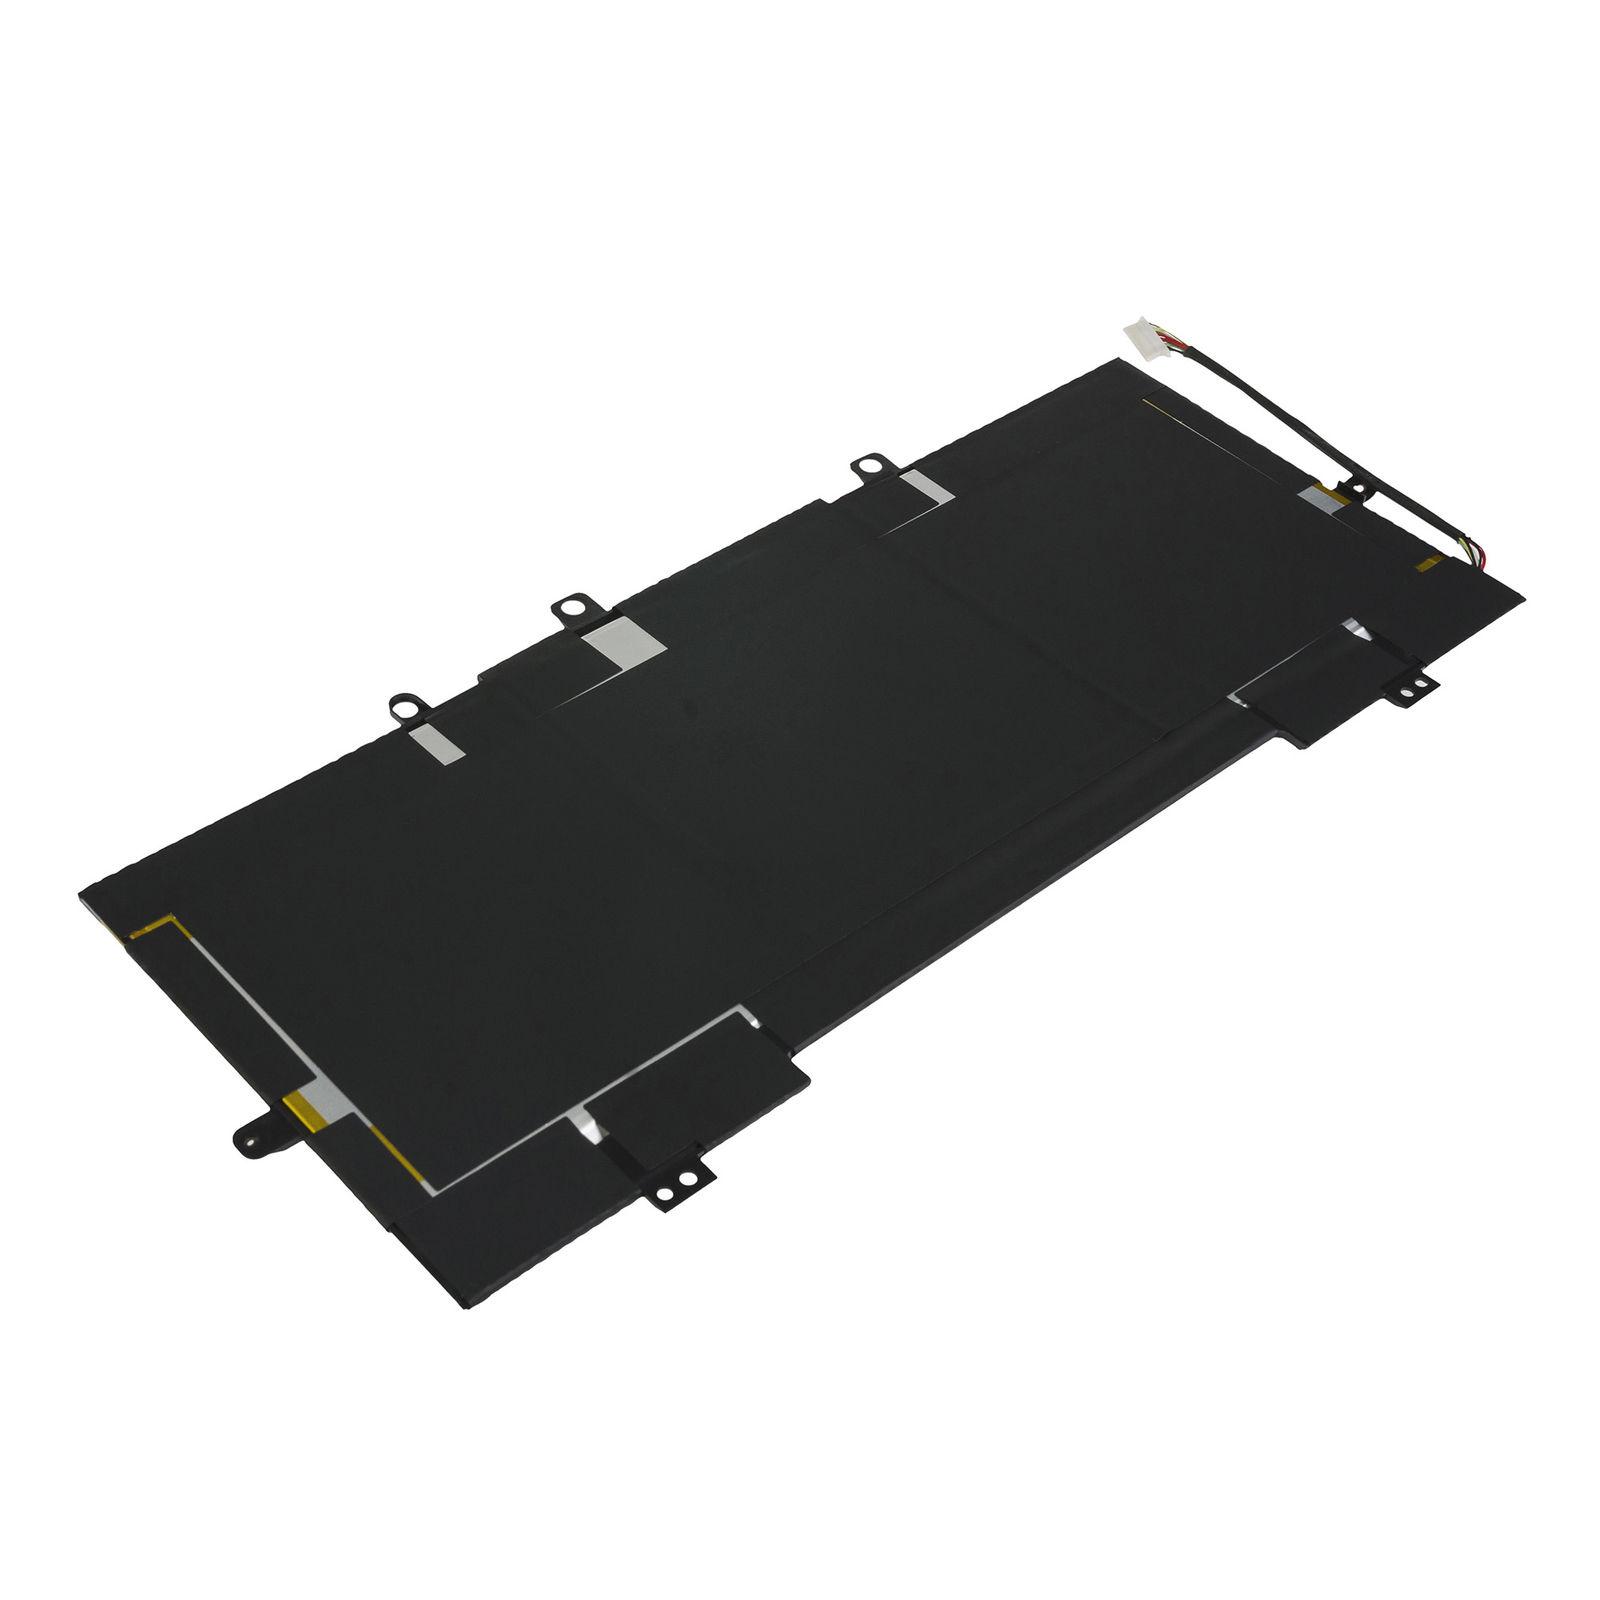 HP VR03XL 816238-850 HSTNN-IB7E Envy 13-d001tu 13-d004tu Ersatz Akku